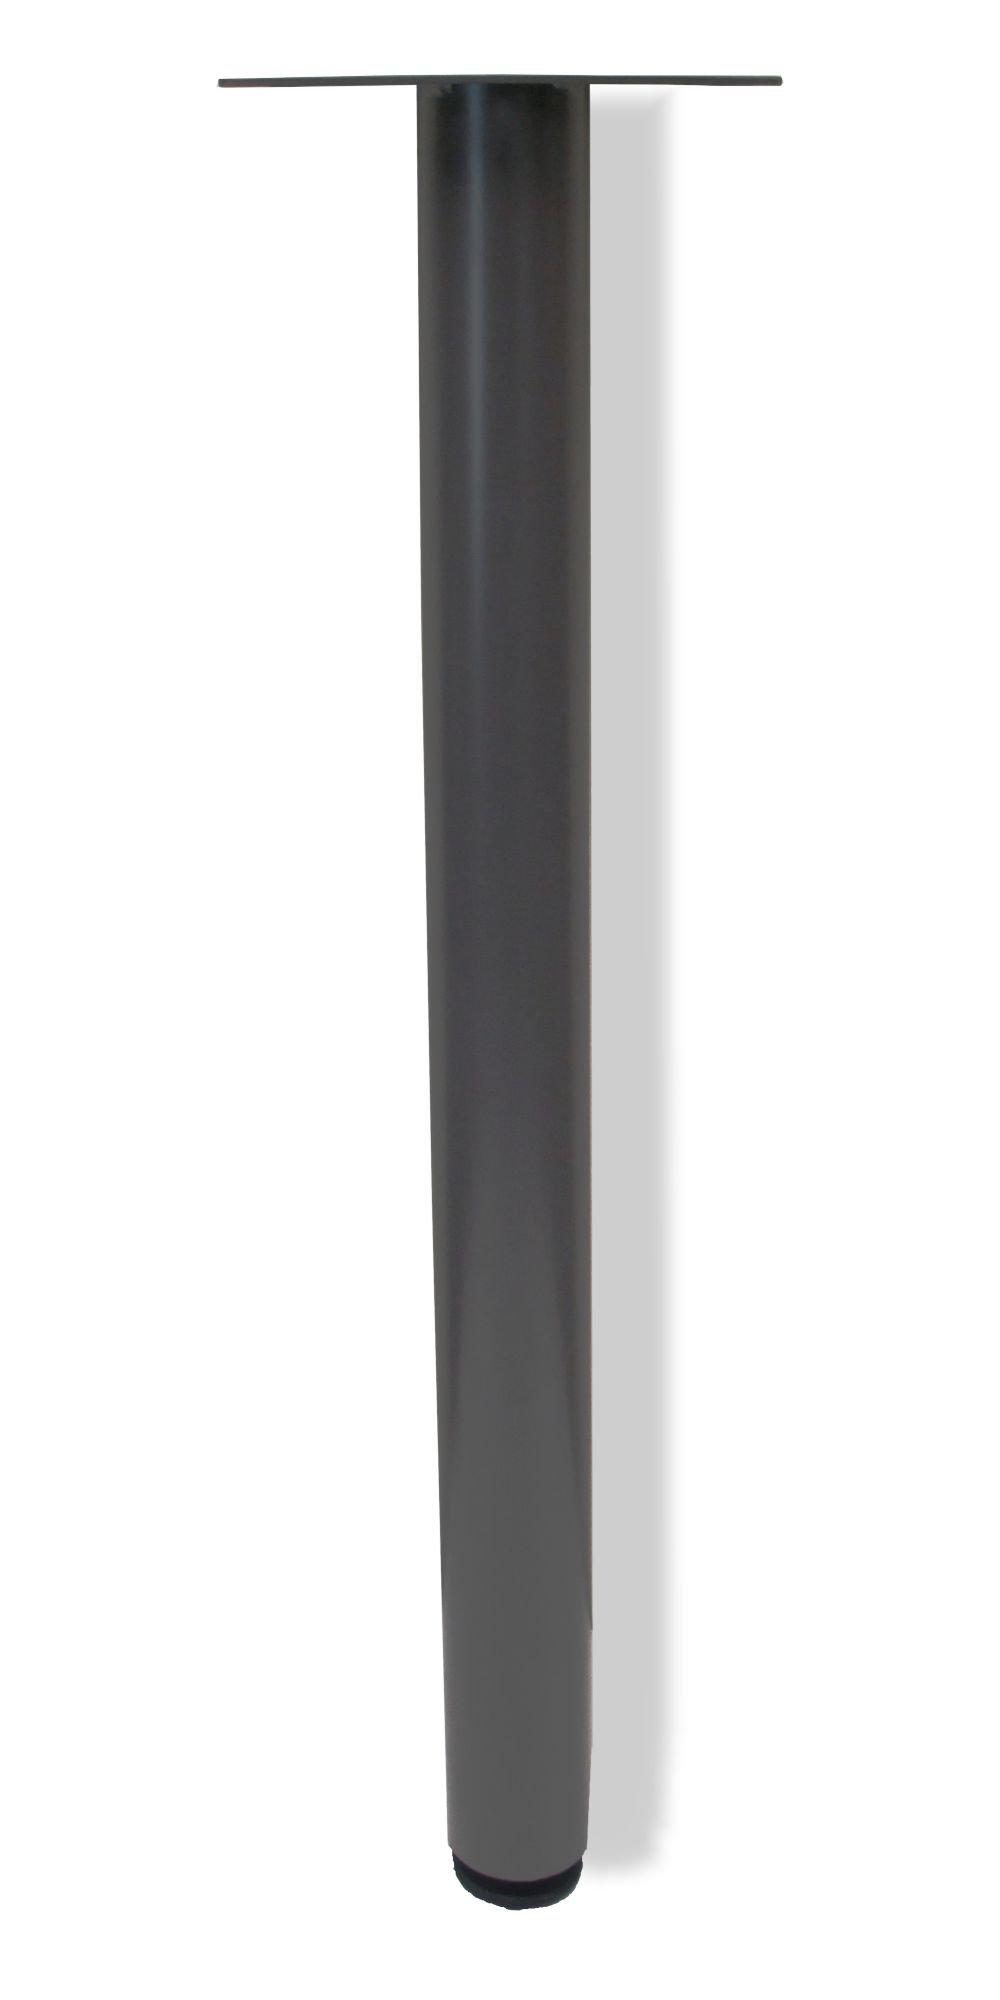 Table Leg Single 2'' Medium Tone with Glide